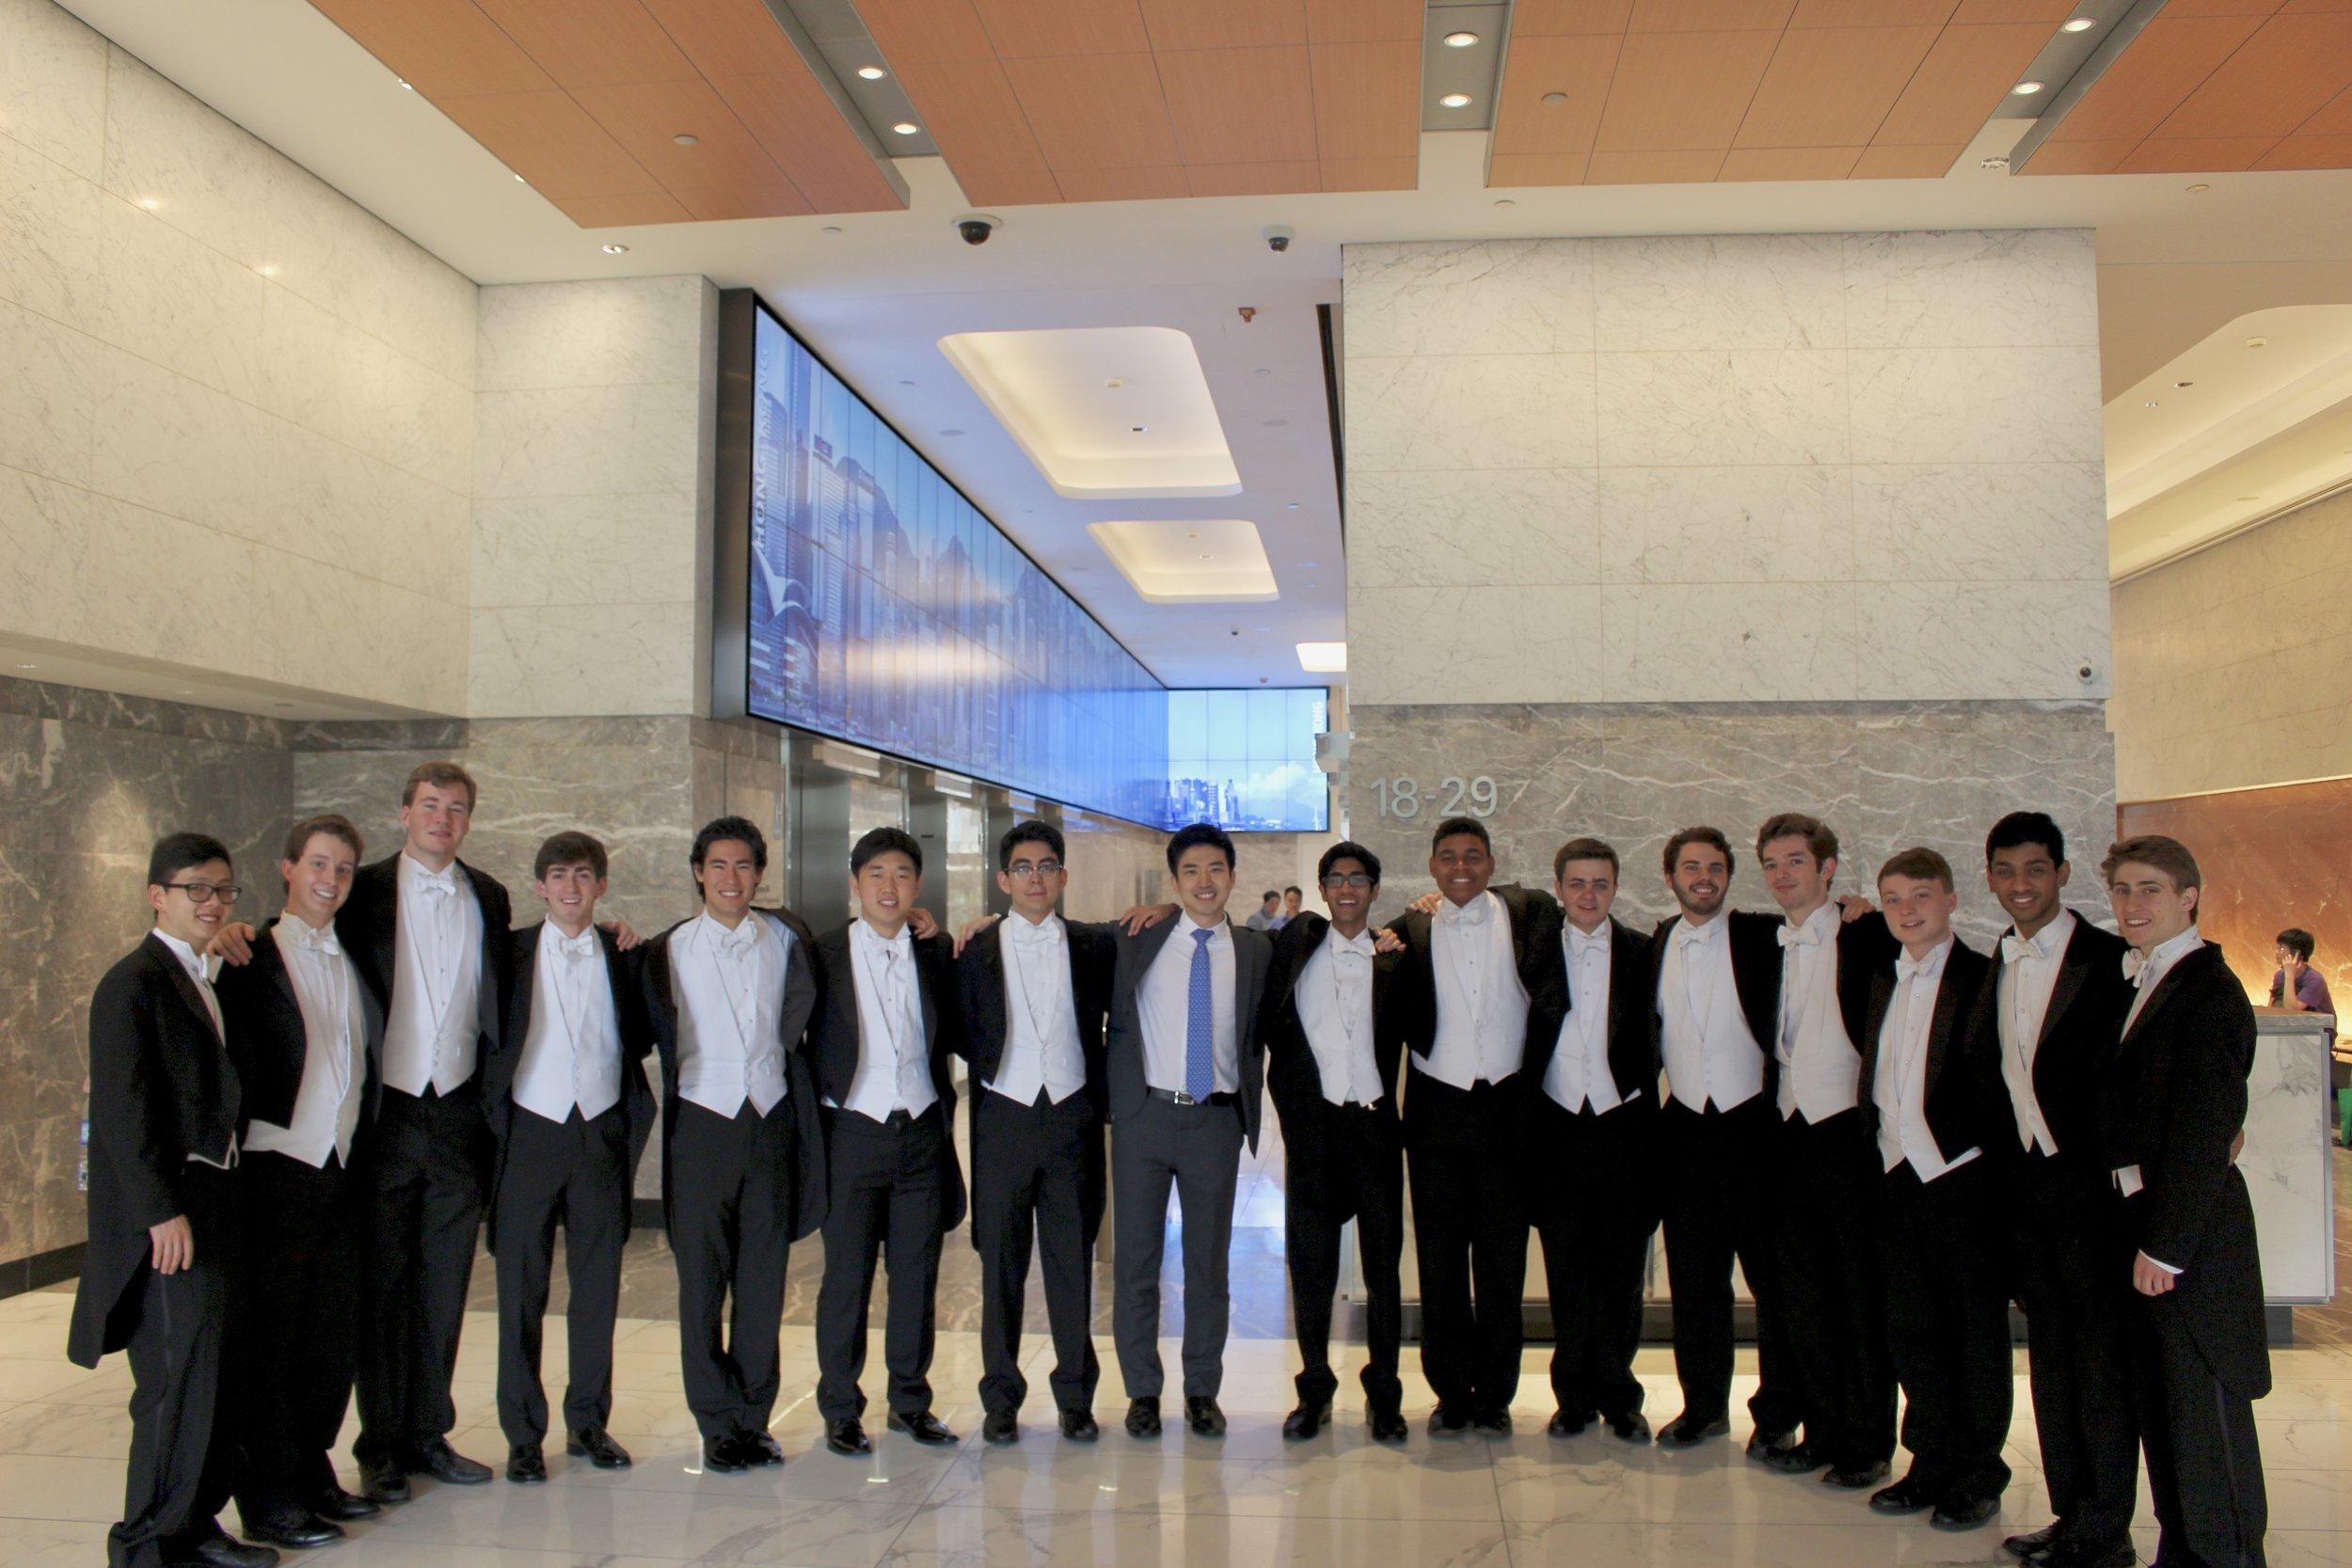 The Cats perform at J.P. Morgan Bank with alumnus Kyeong-Sik Seoung ('15)